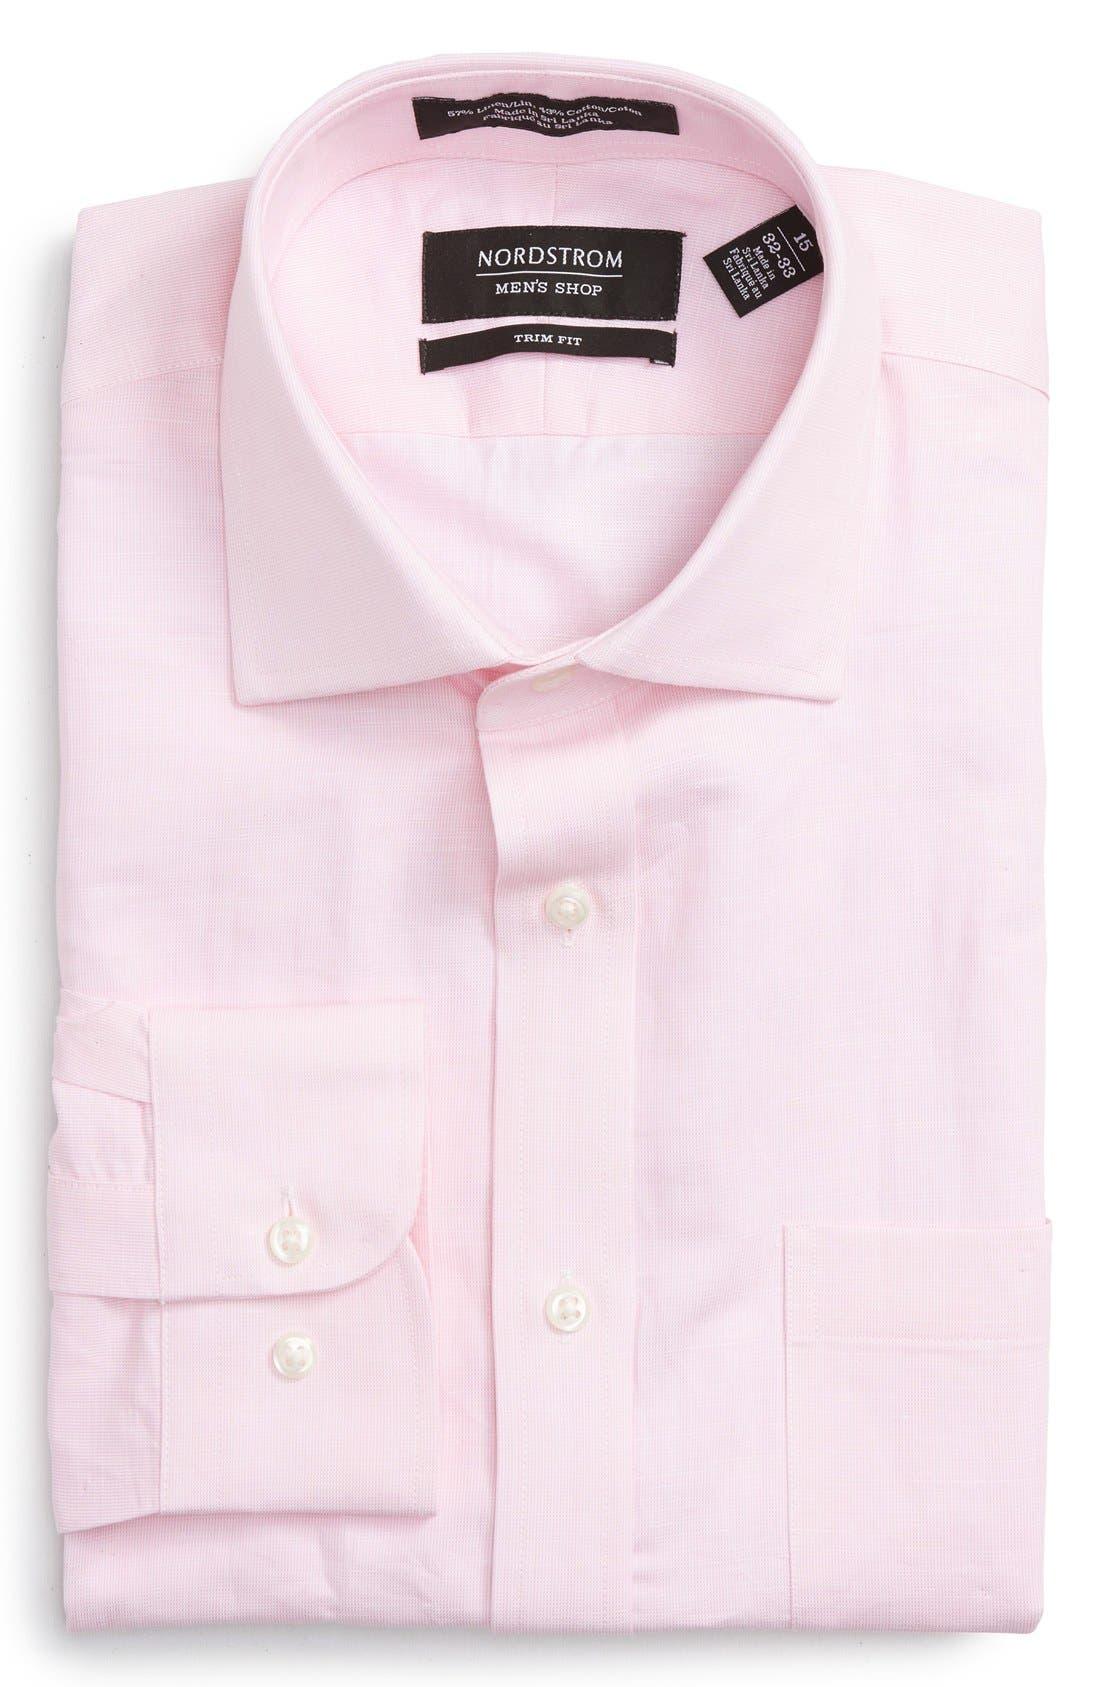 Alternate Image 1 Selected - Nordstrom Men's Shop Trim Fit Solid Linen & Cotton Dress Shirt